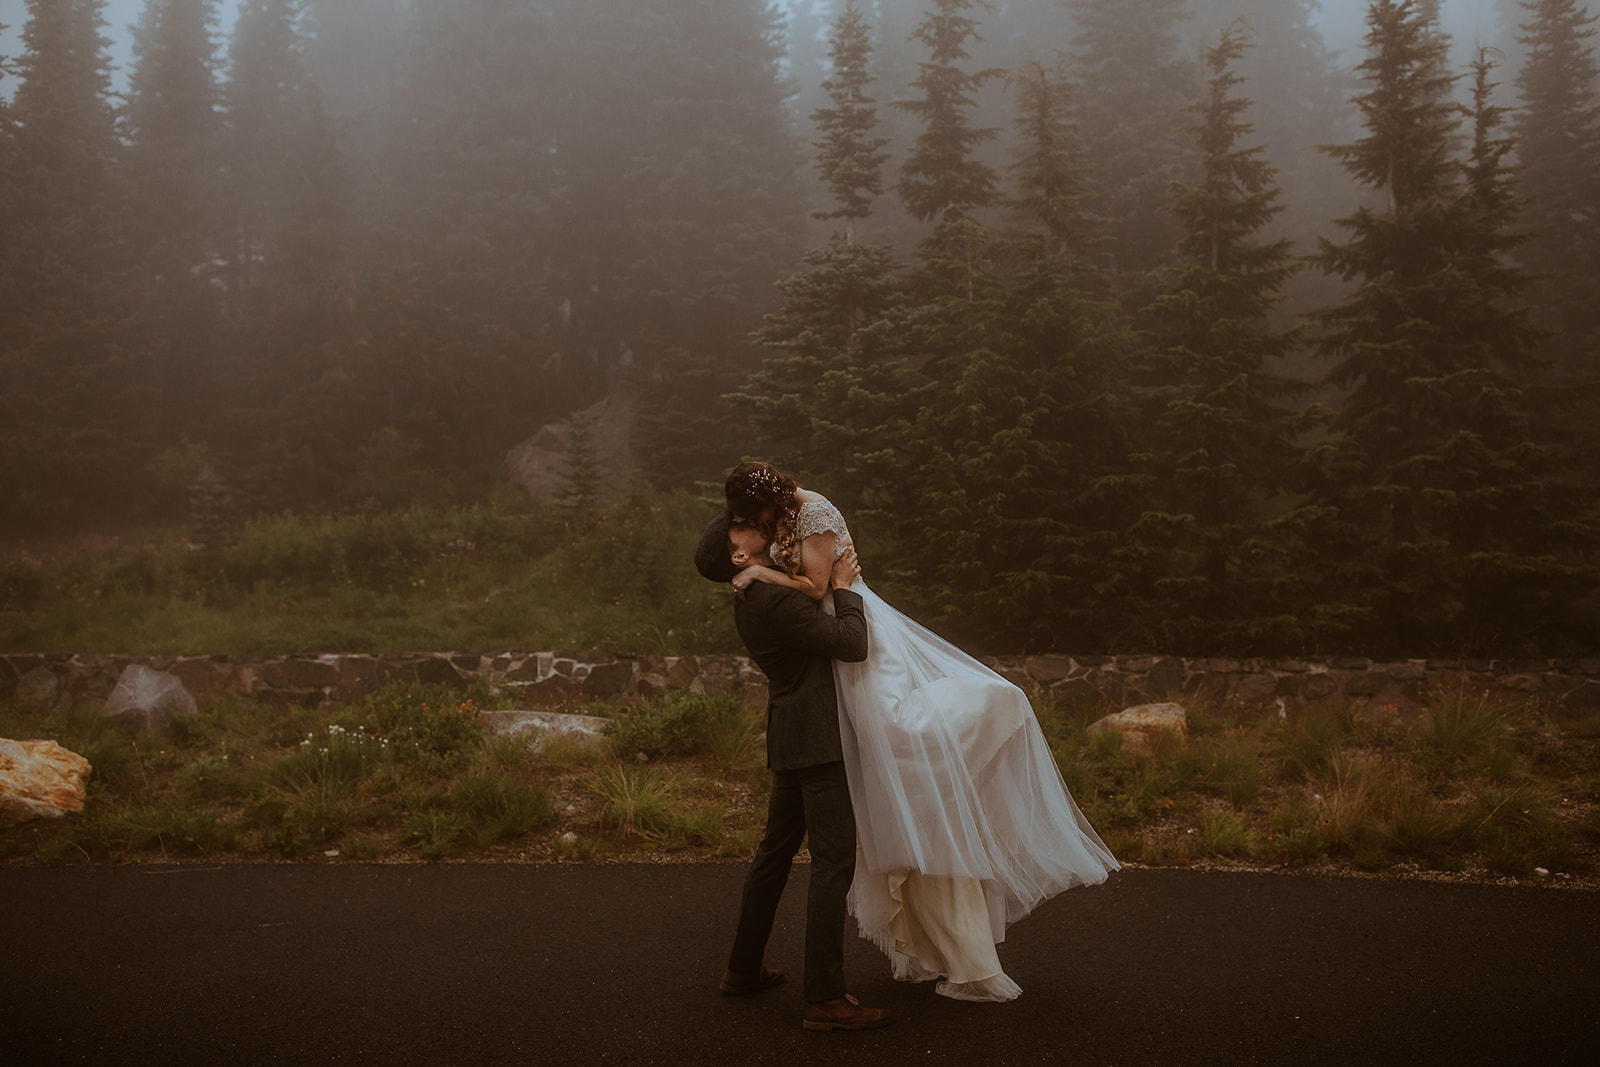 mount-rainier-cabin-elopement-megan-gallagher-photography_(457_of_568).jpg